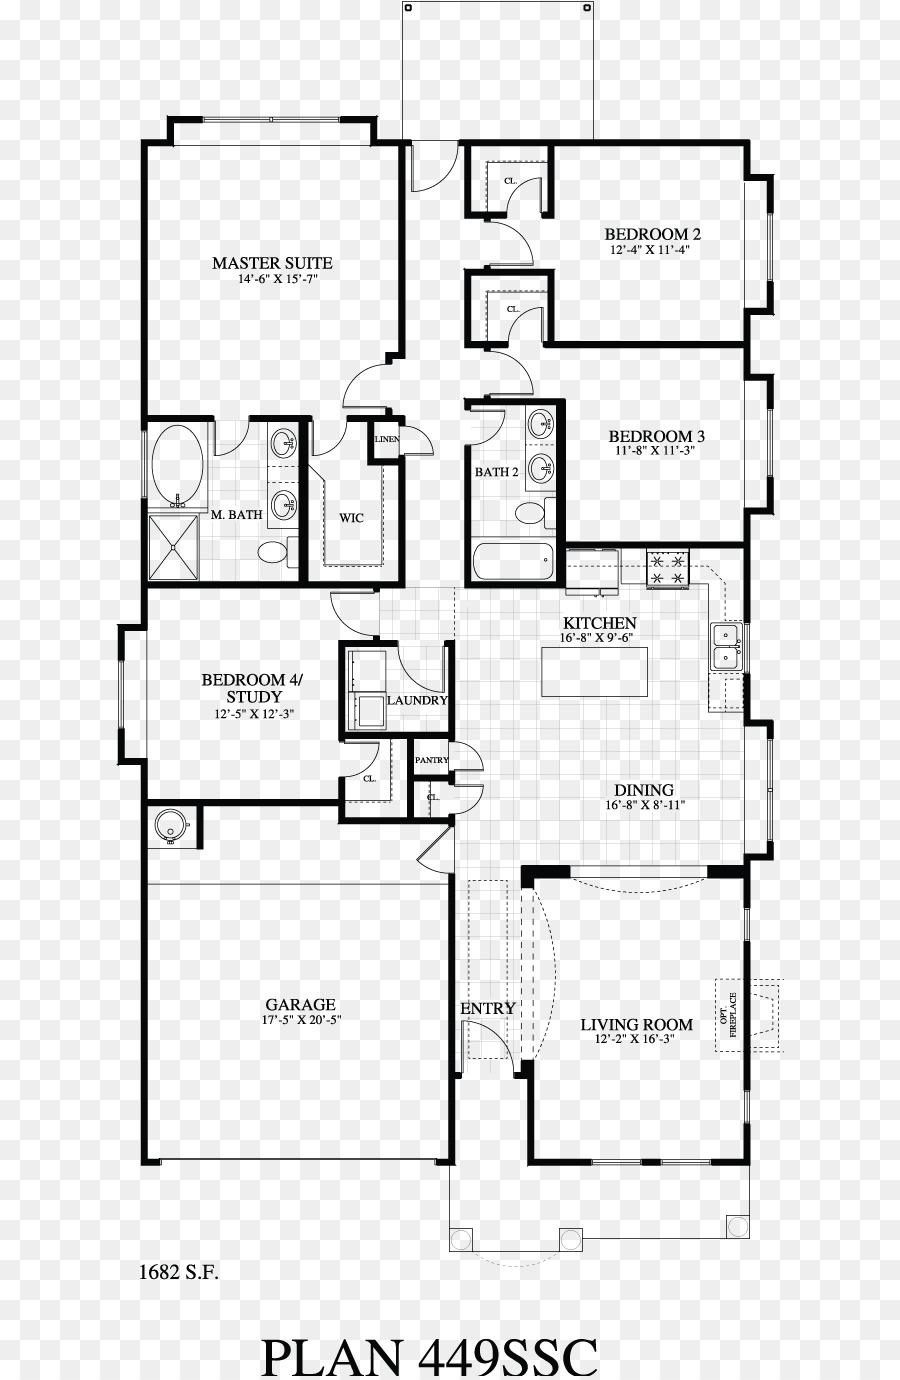 Saratoga homes el paso floor plans gurus floor for Saratoga homes floor plans